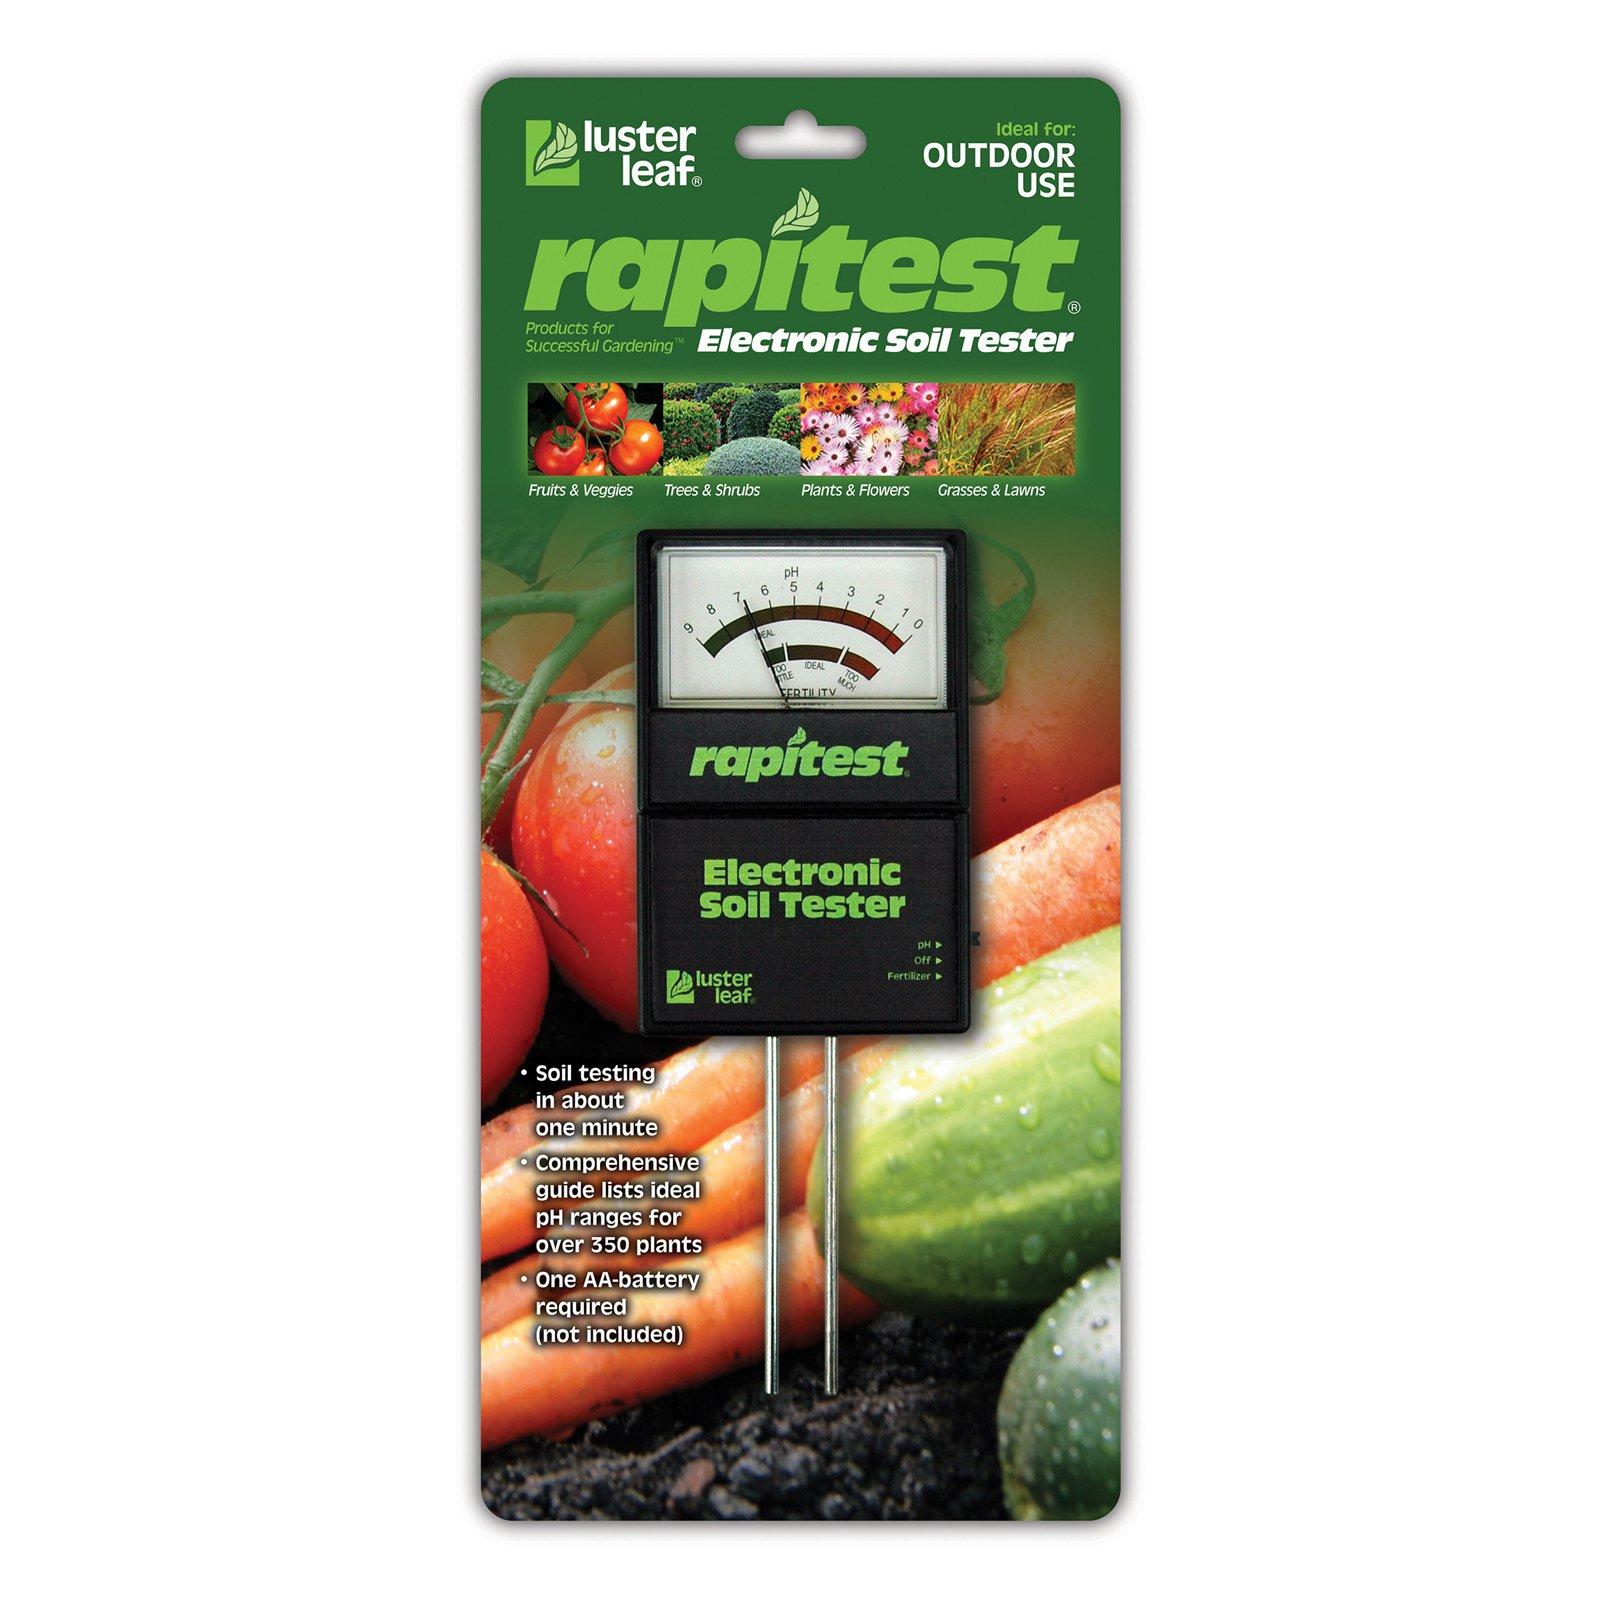 Luster Leaf Electronic Soil Tester